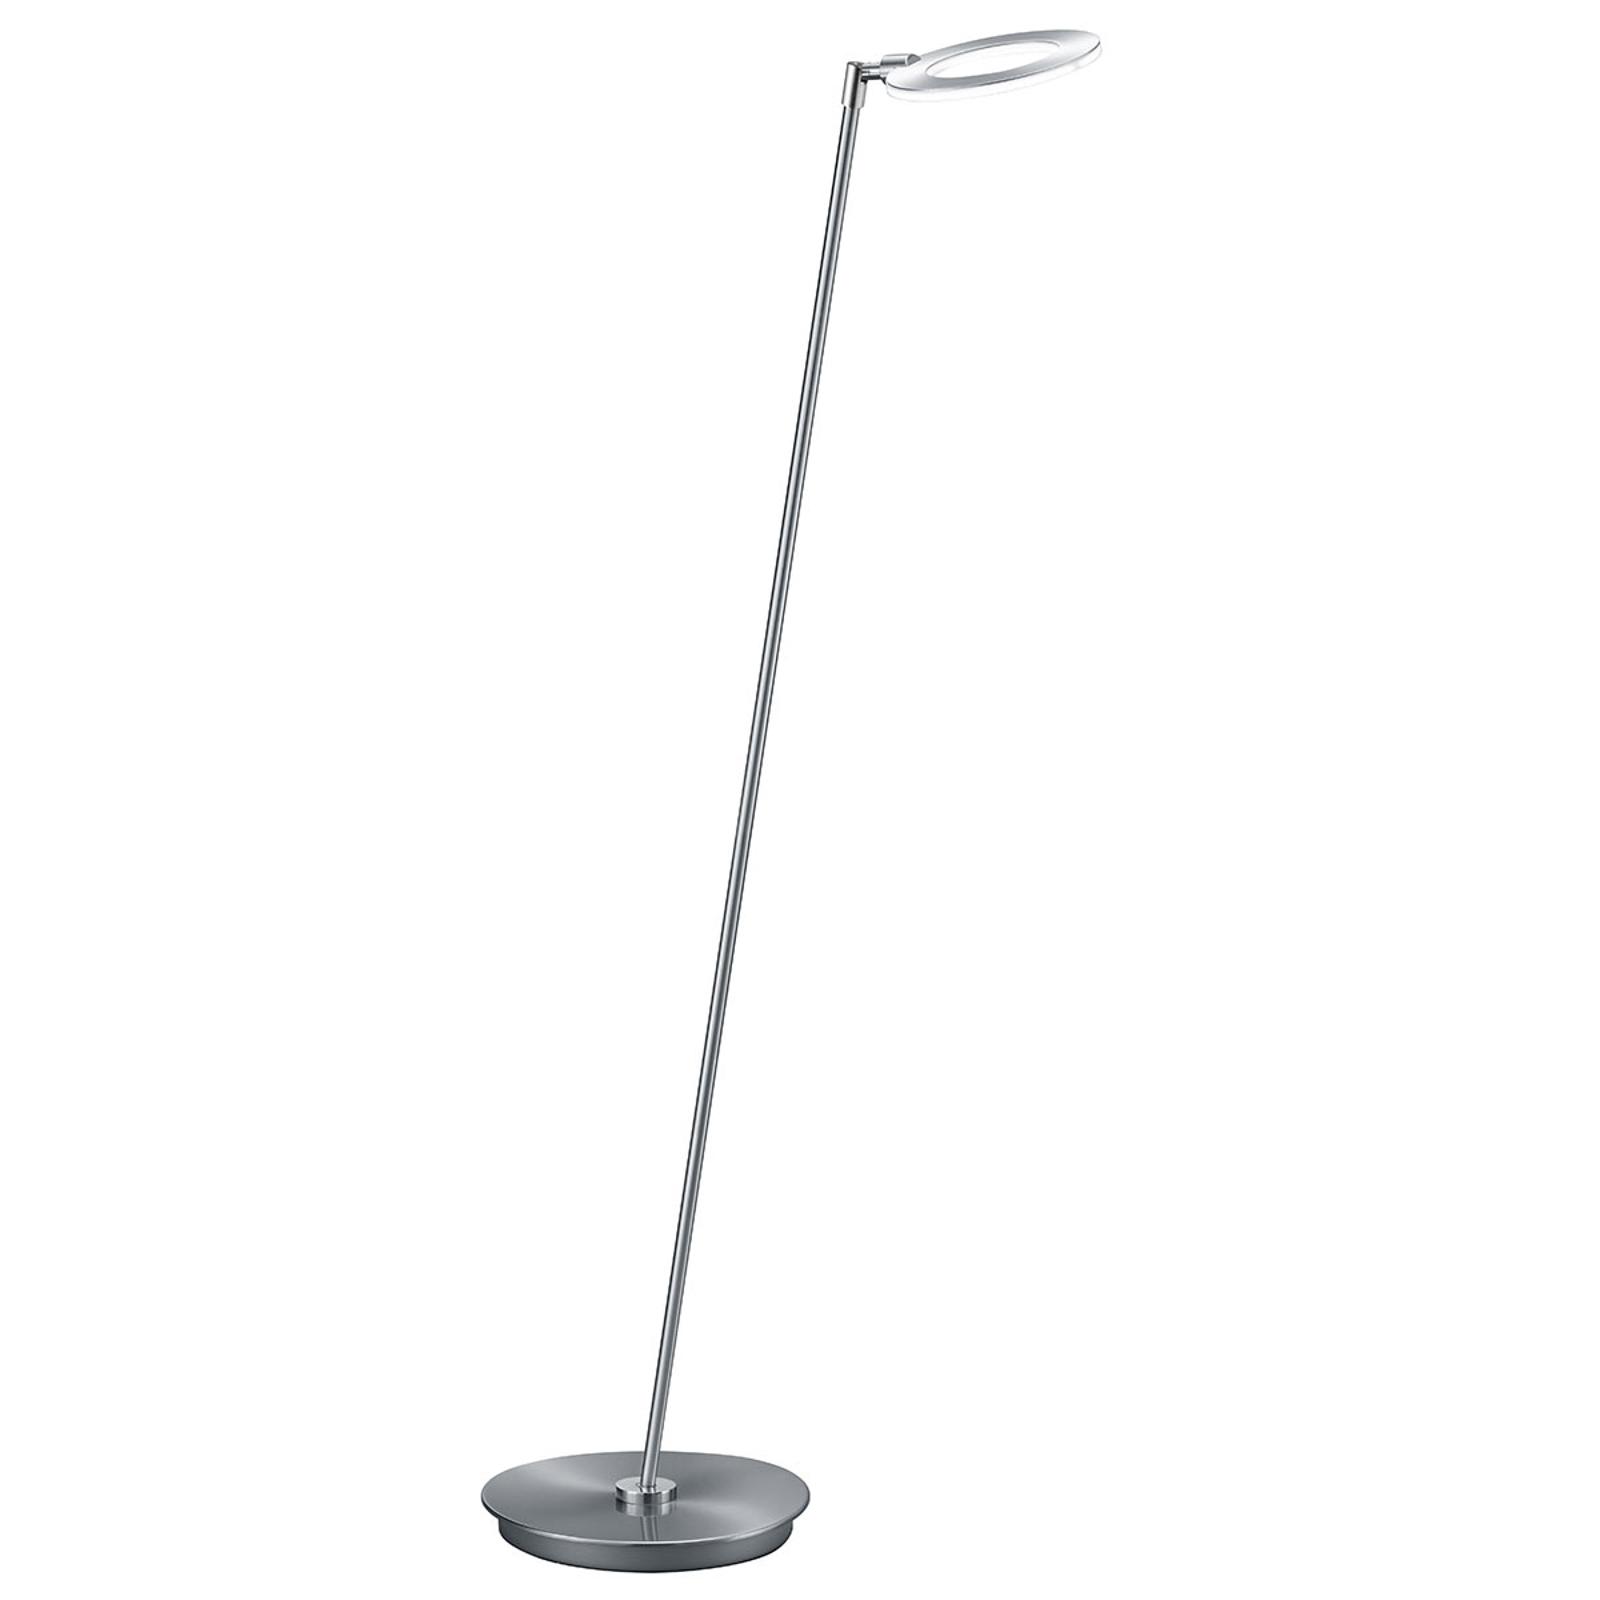 B-Leuchten Mica - gulvlampe fleksibel retning